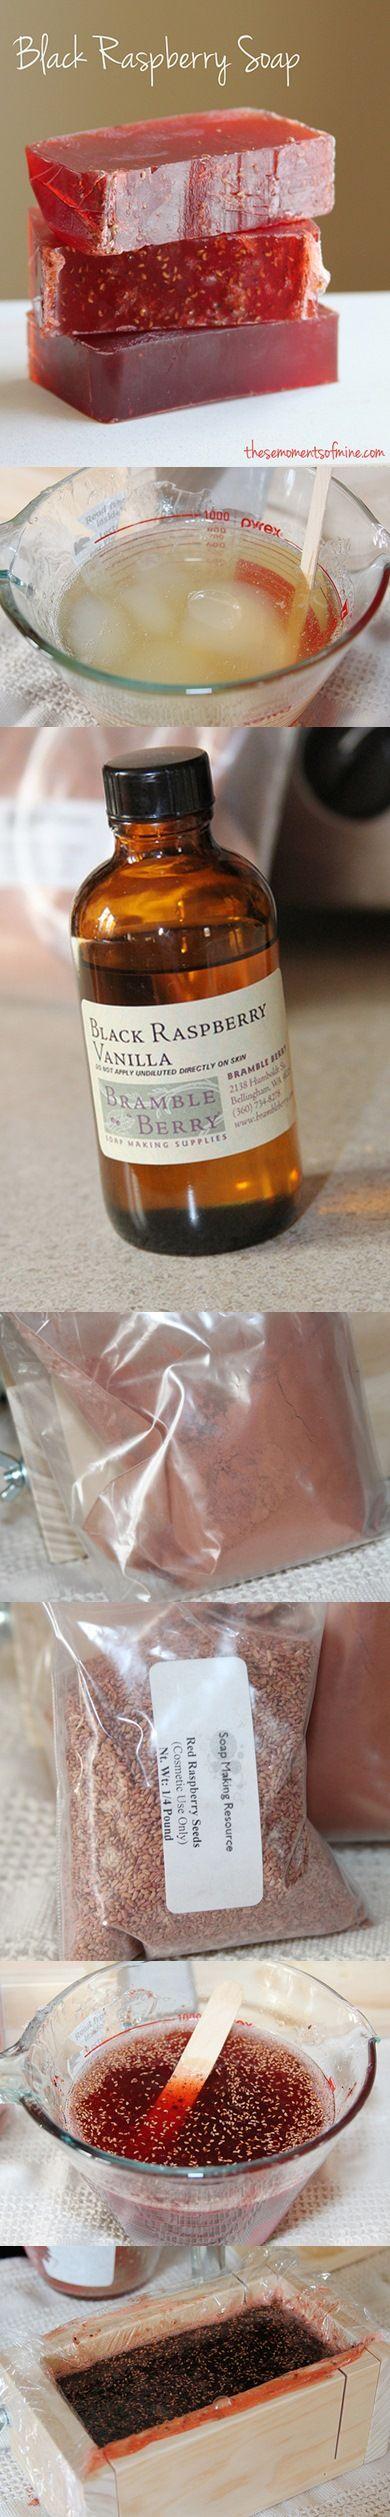 DIY Black Raspberry Soap